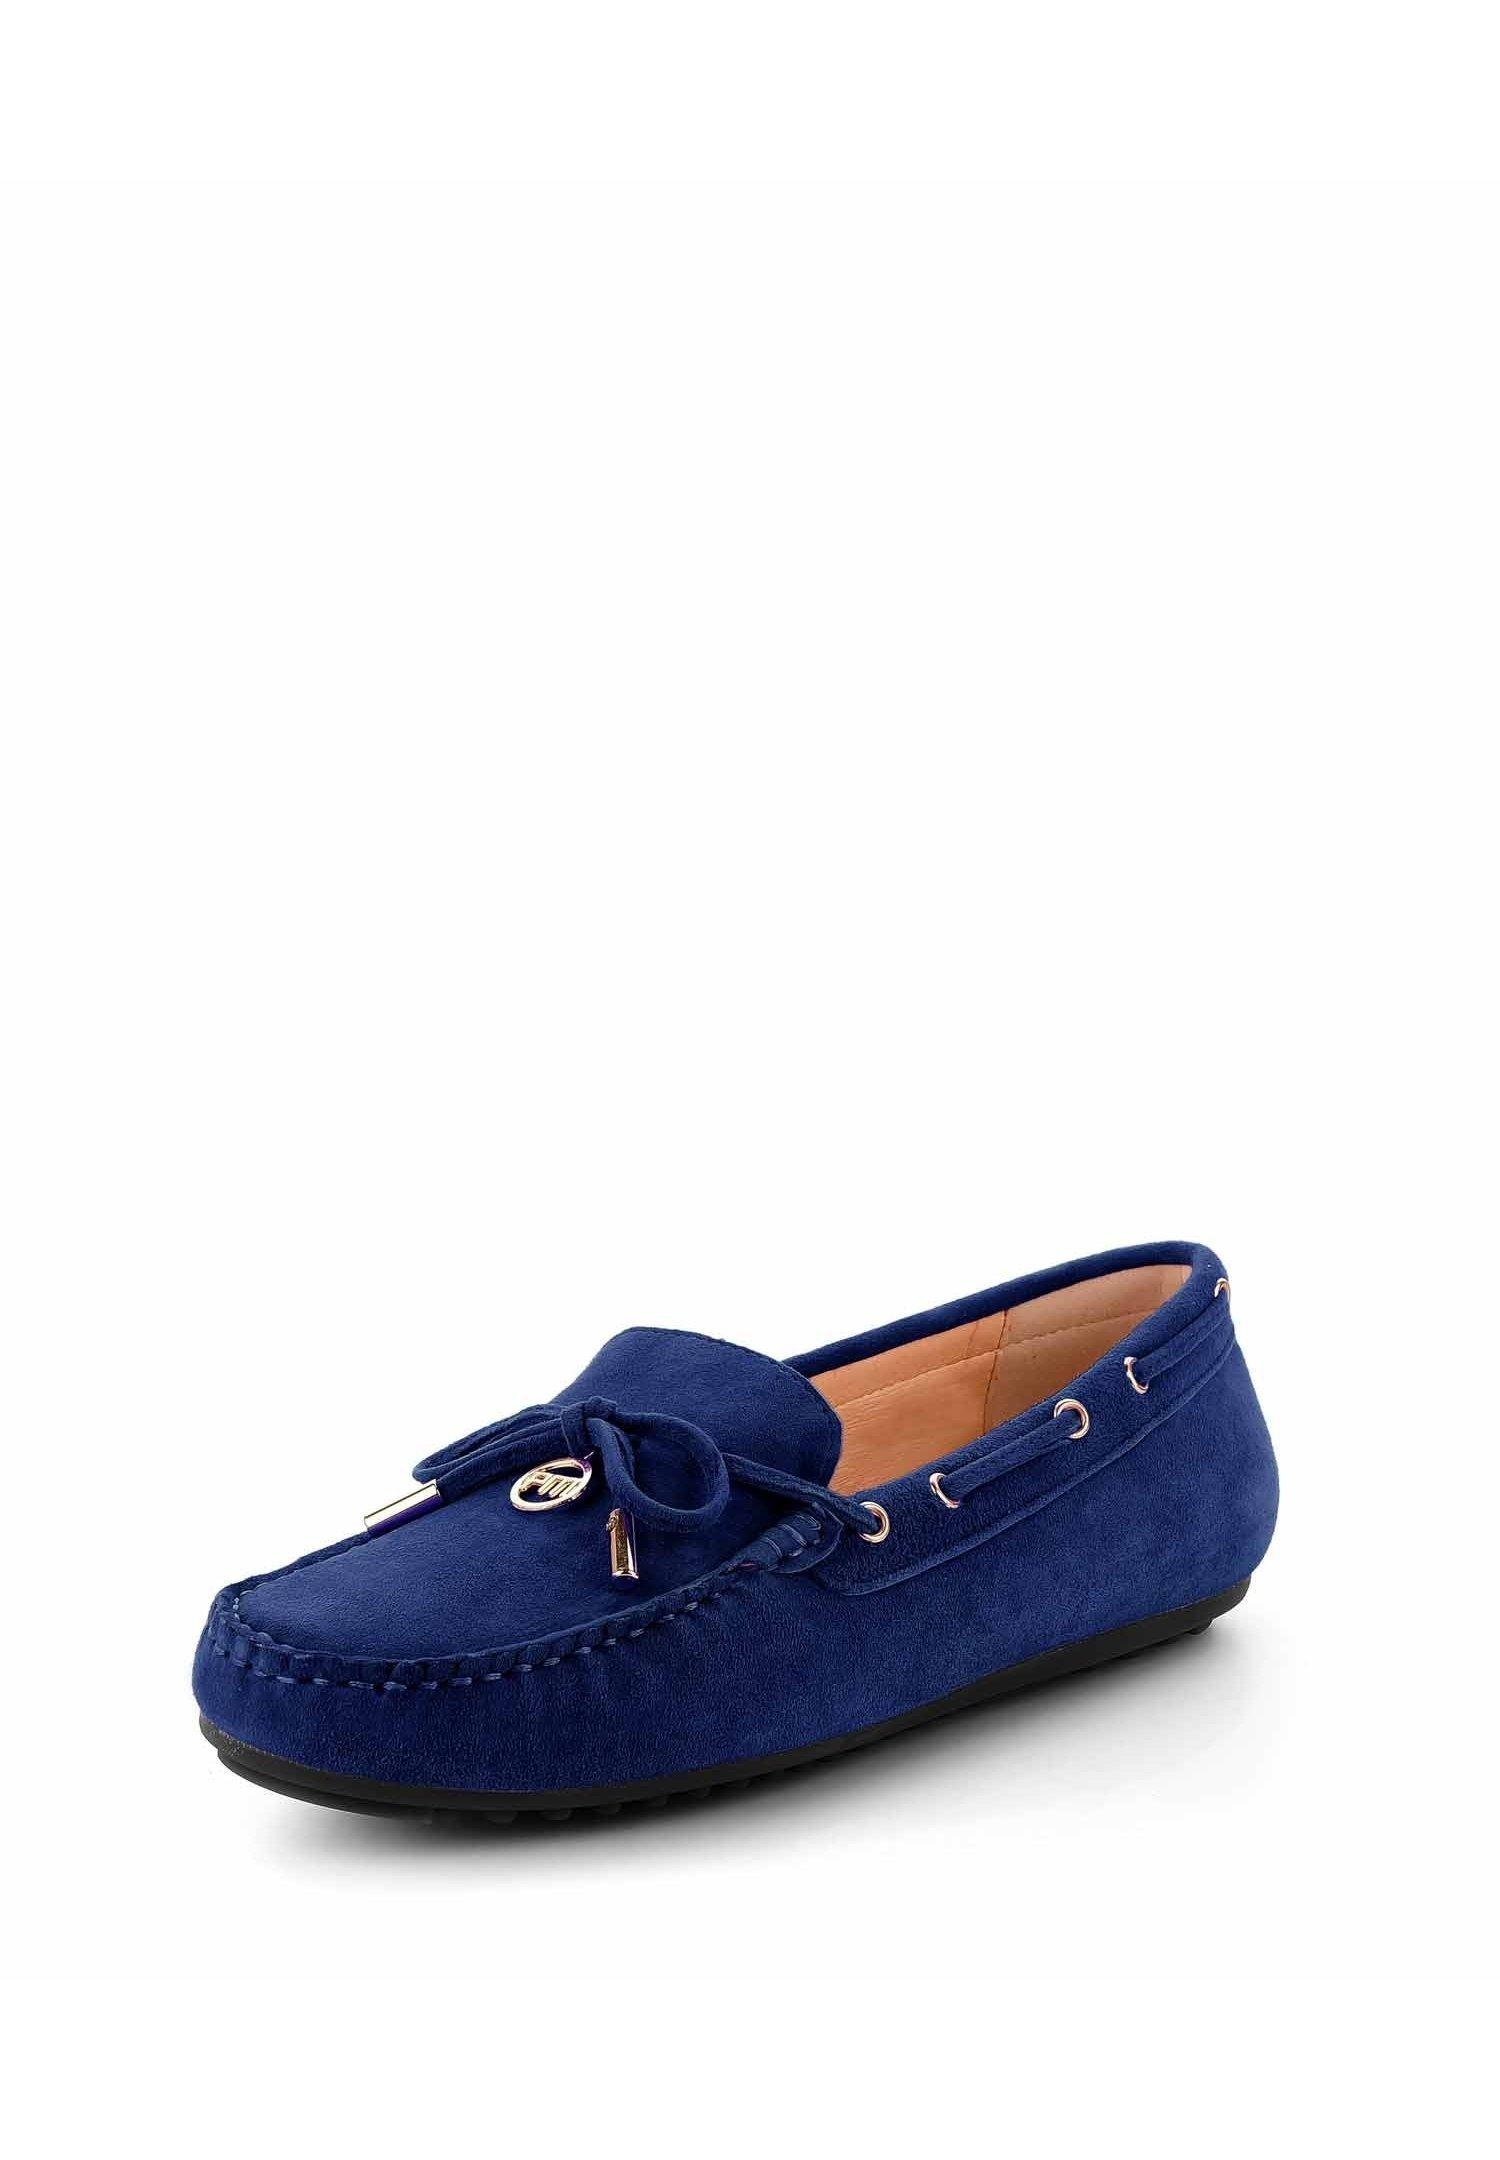 Prima Moda Malpaga - Chaussures Bateau Granatowy